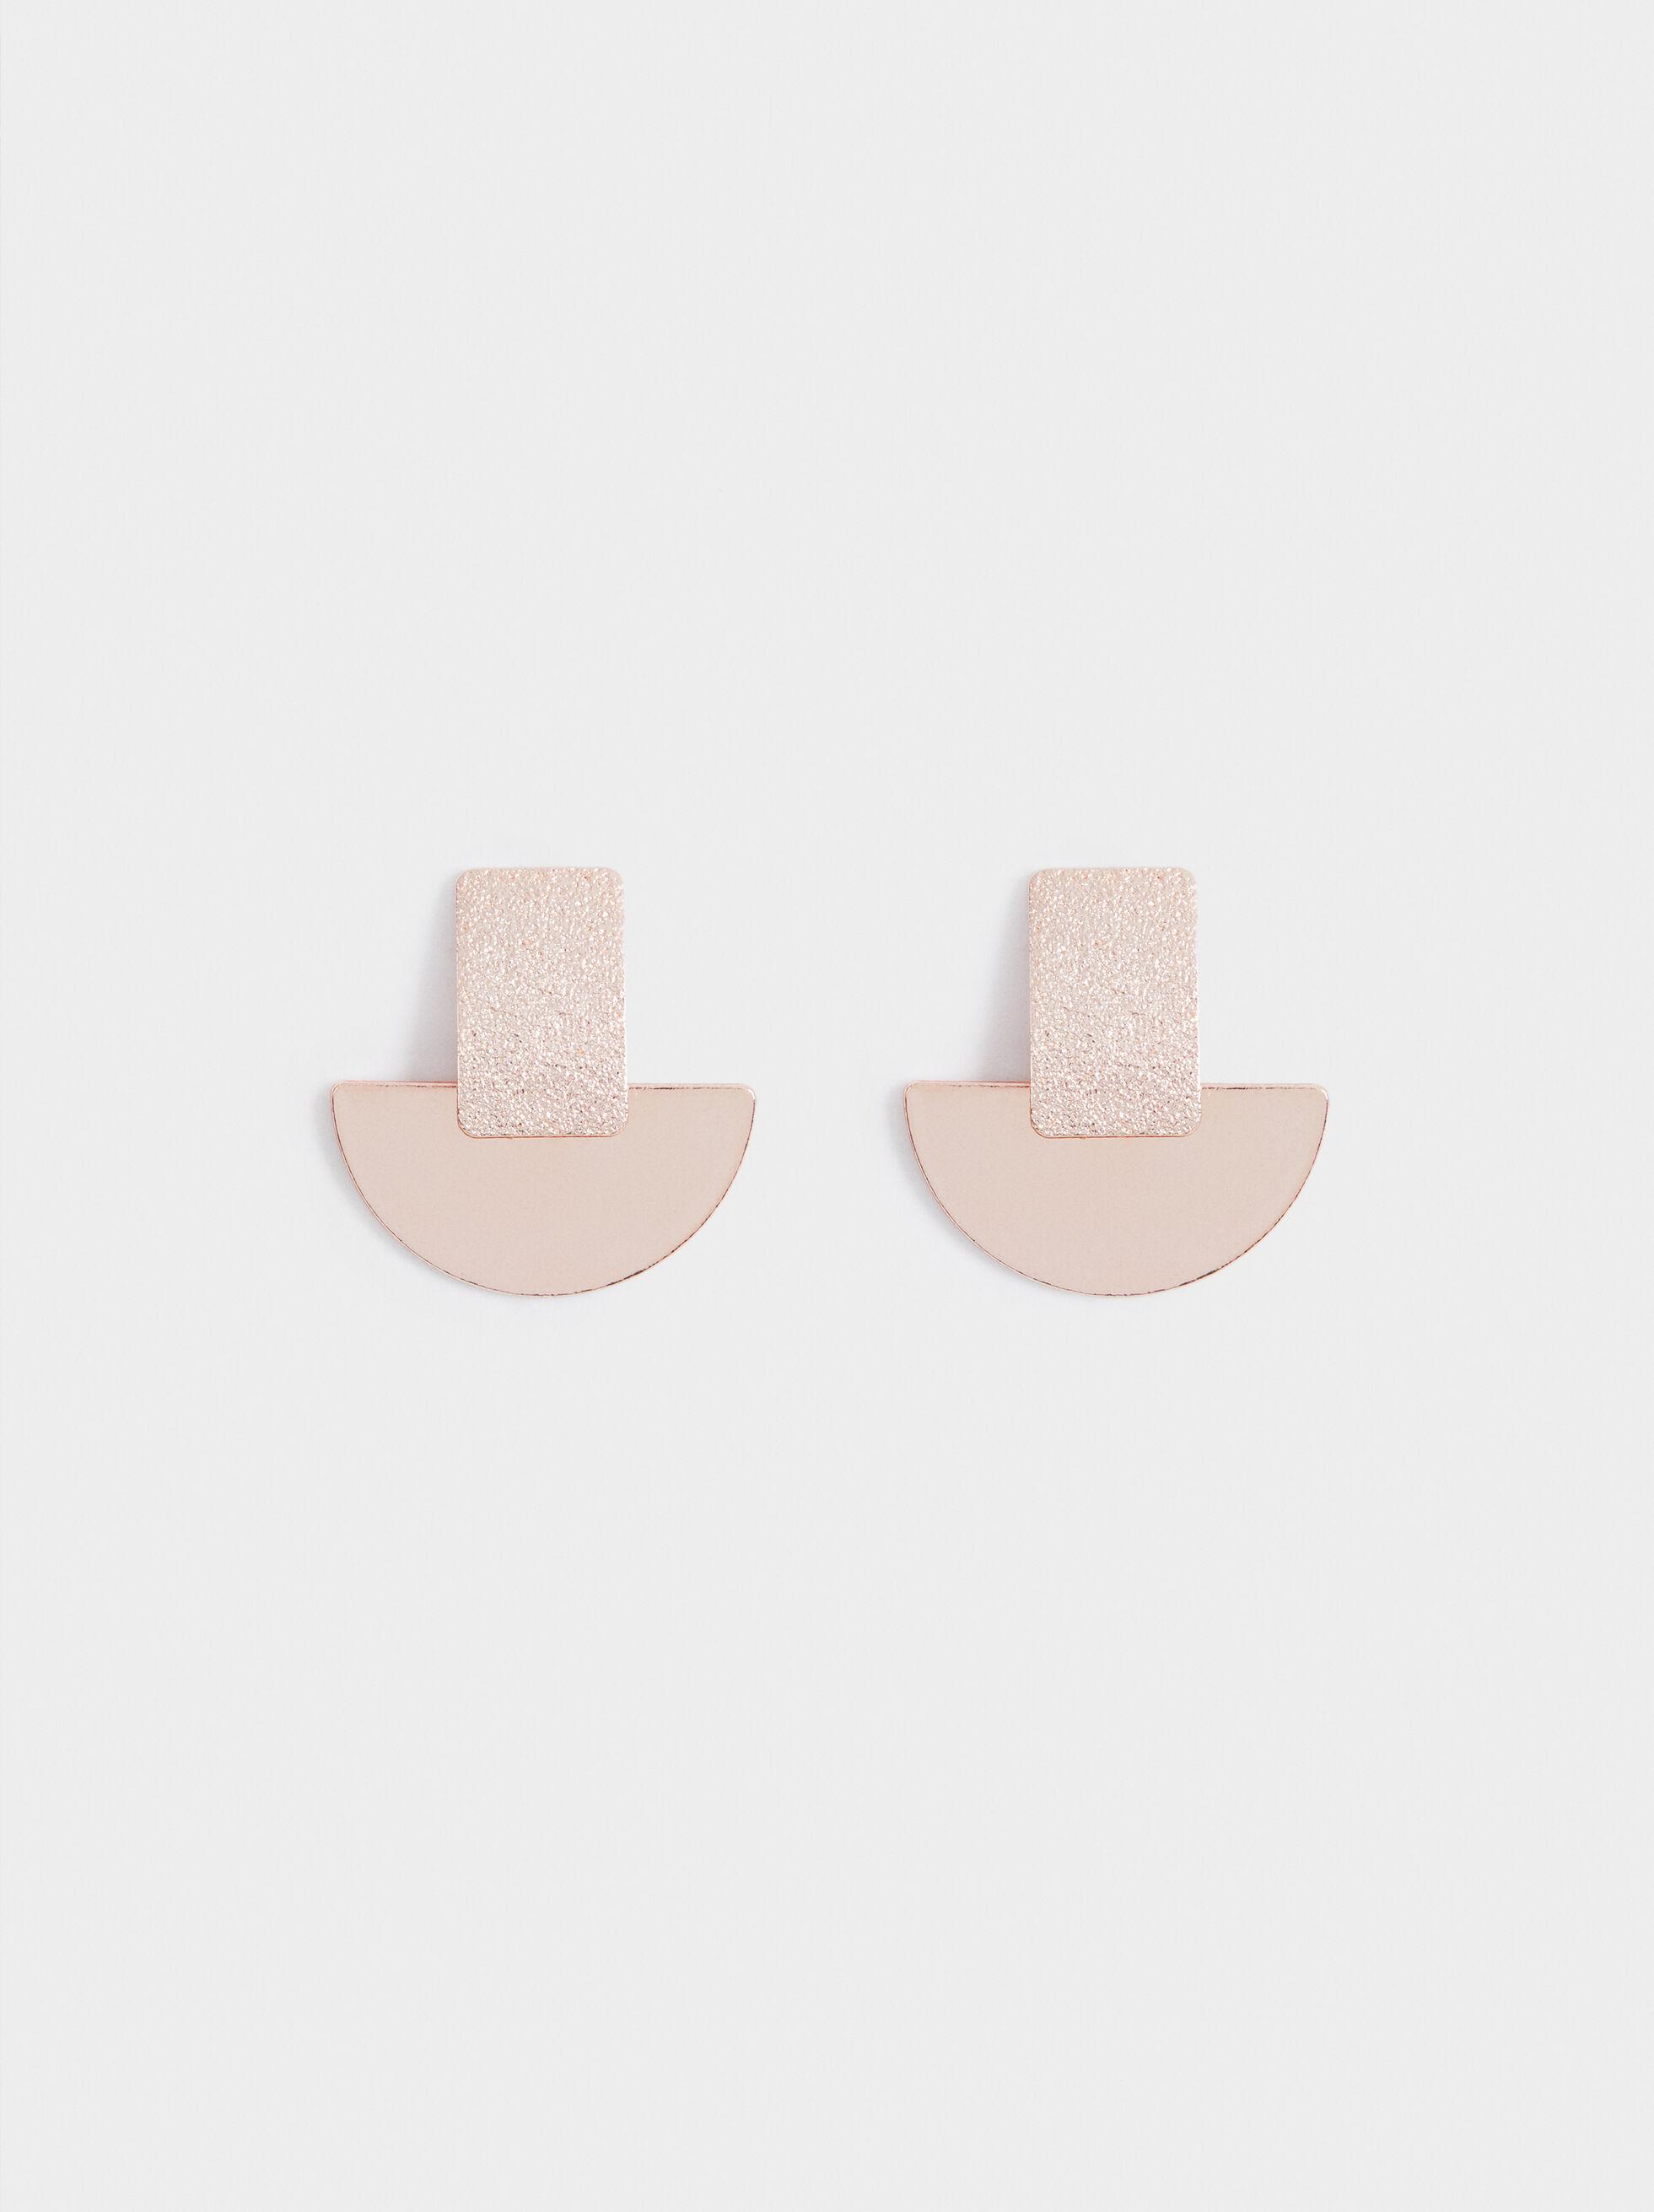 Pink Desert Short Earrings With Geometric Design, Orange, hi-res